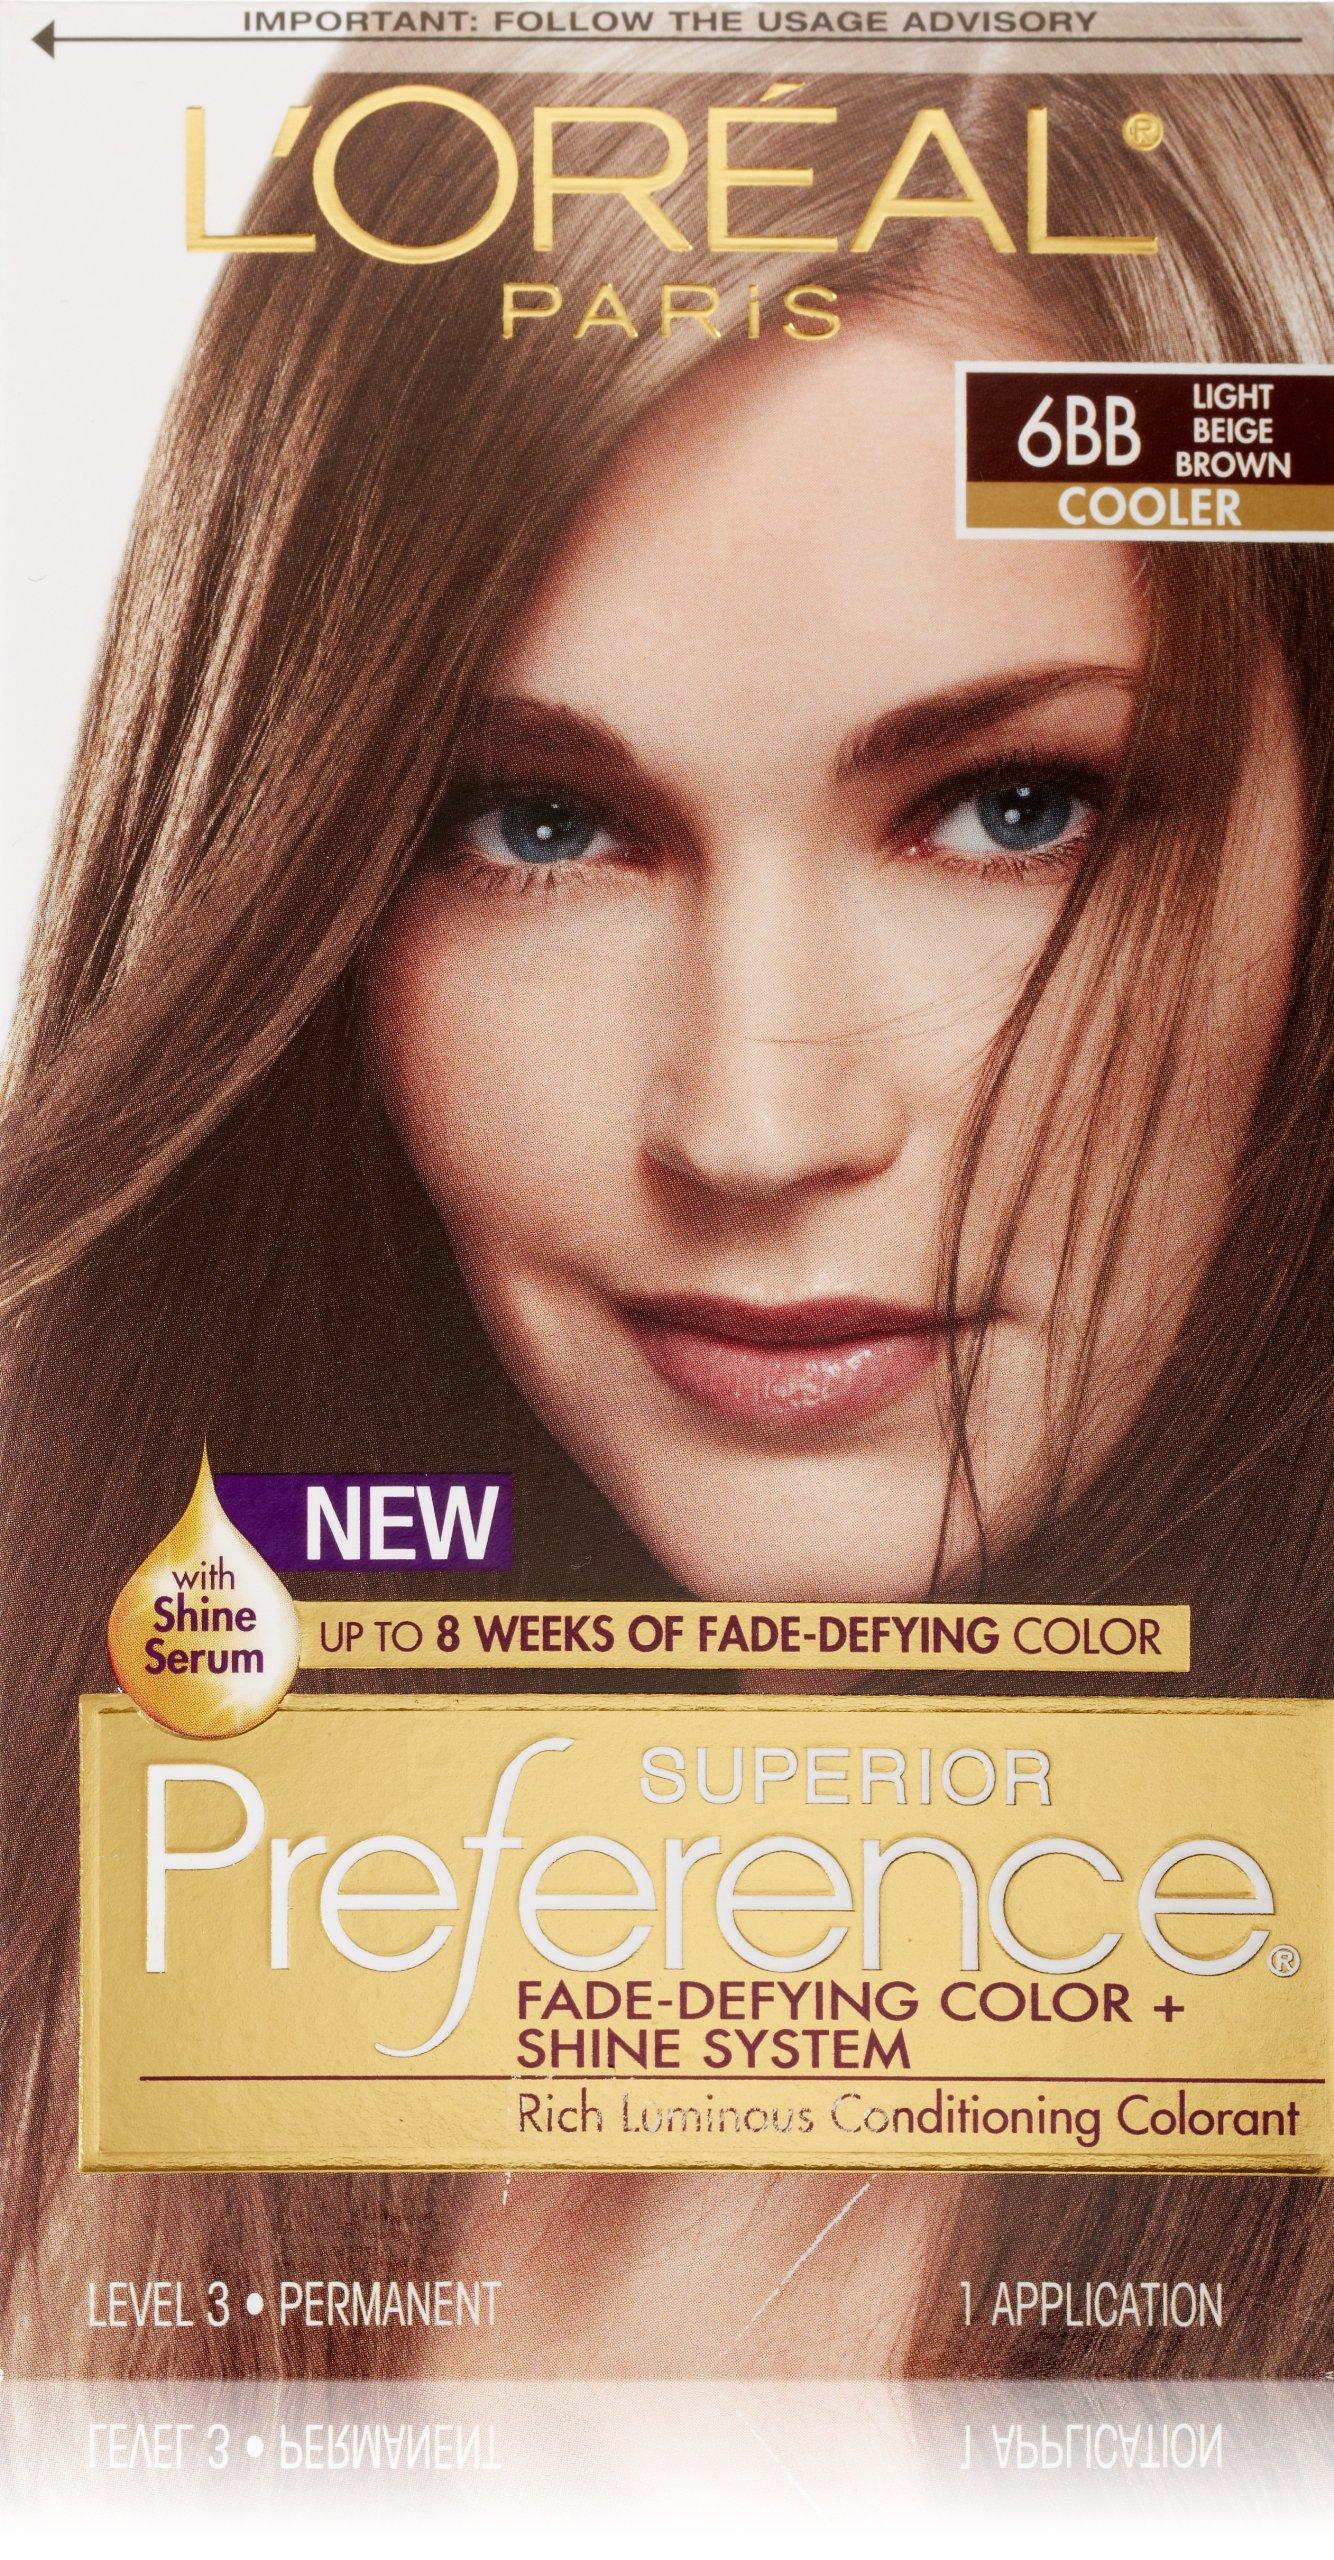 L'Oreal Paris Superior Preference Hair Color, 6BB Light Beige Brown